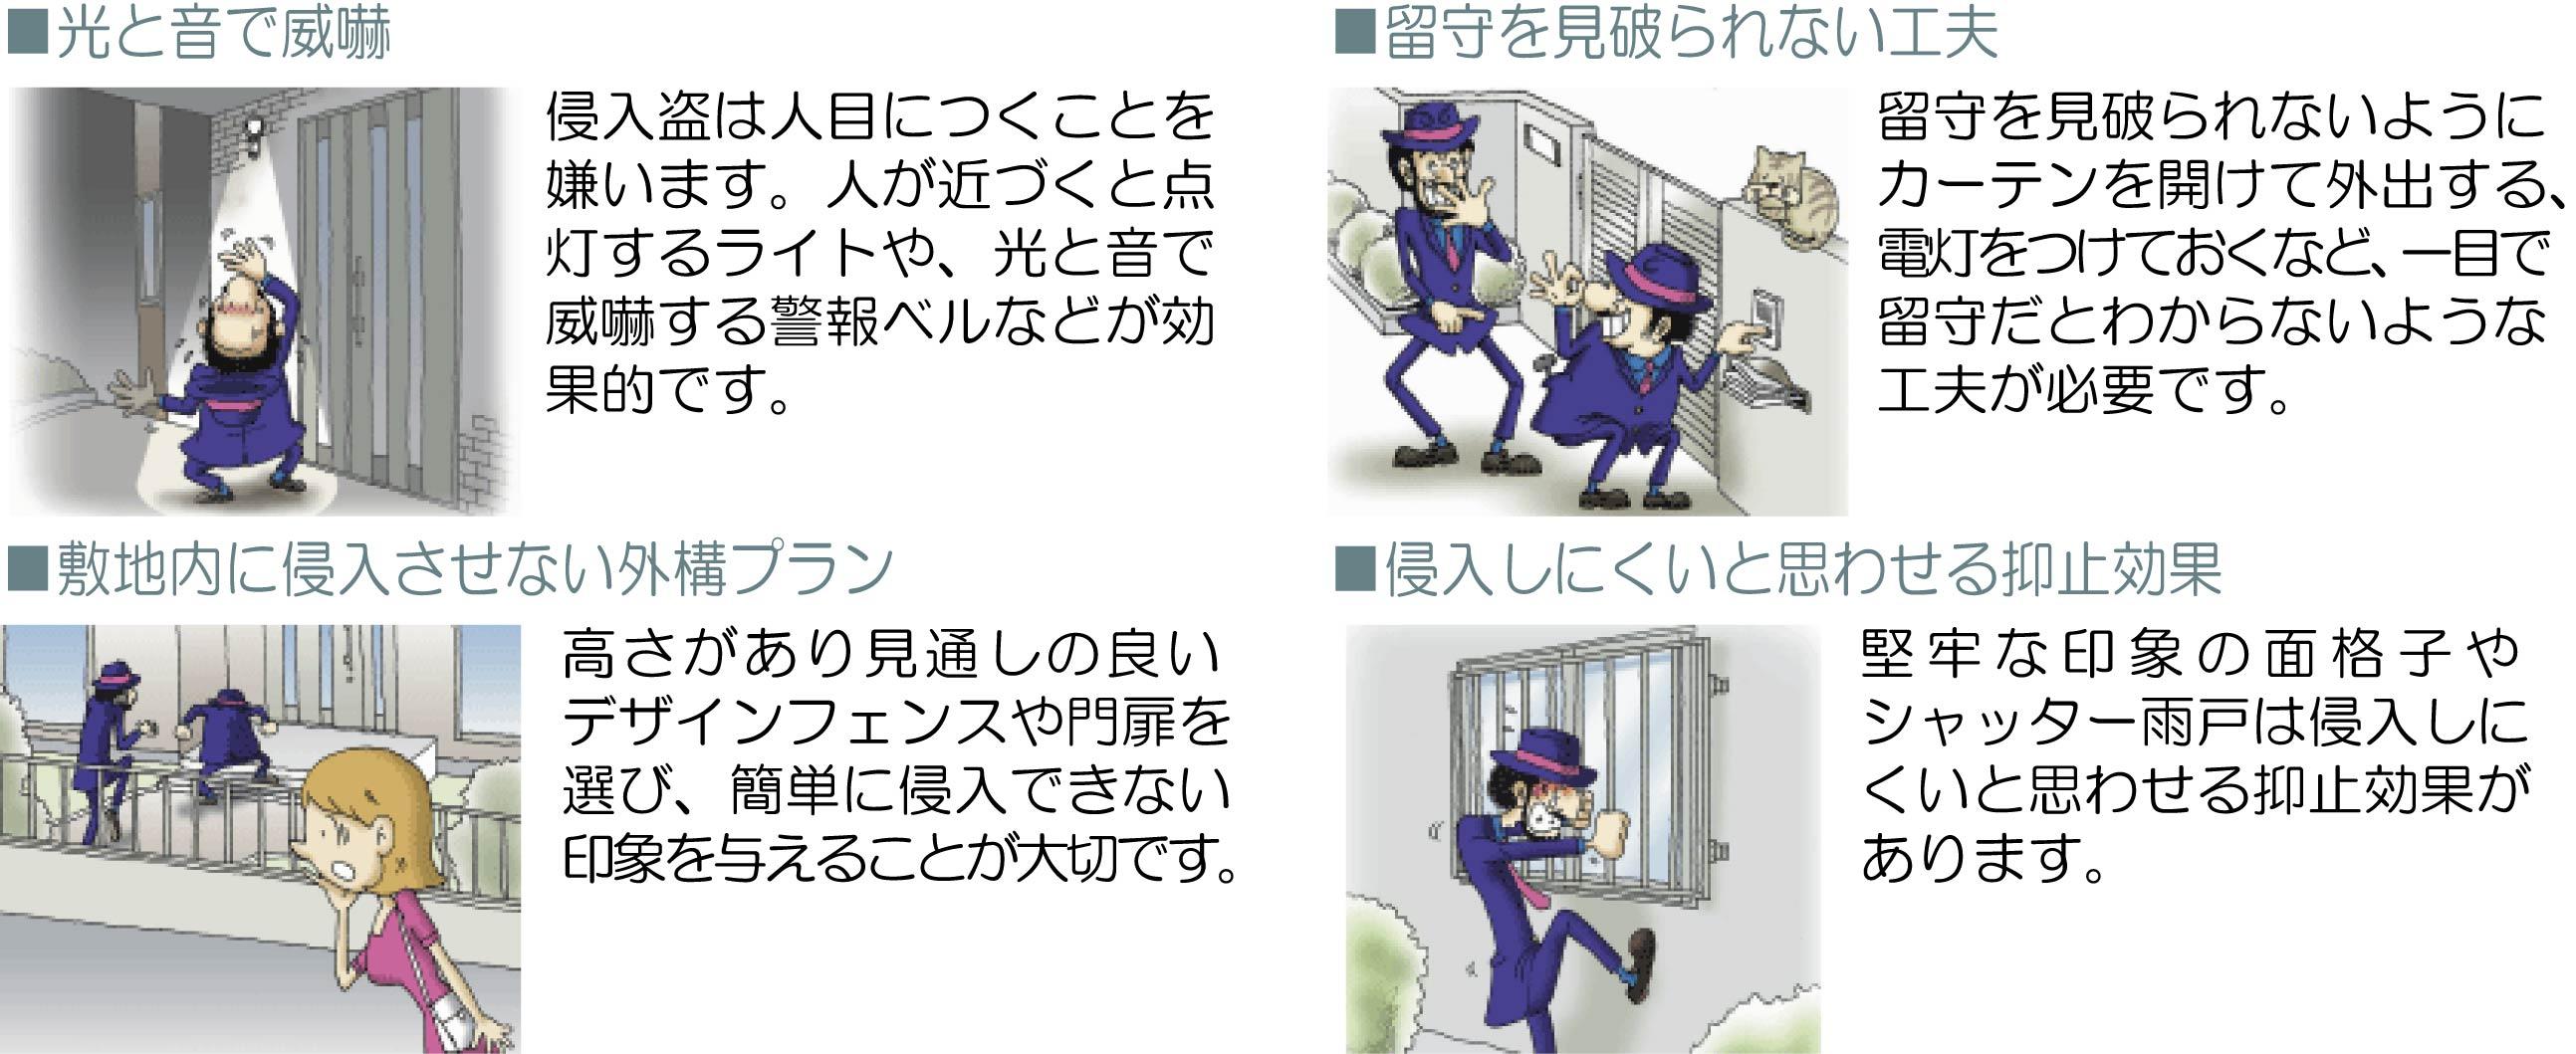 KuraSi-natu-sin72-12.jpg